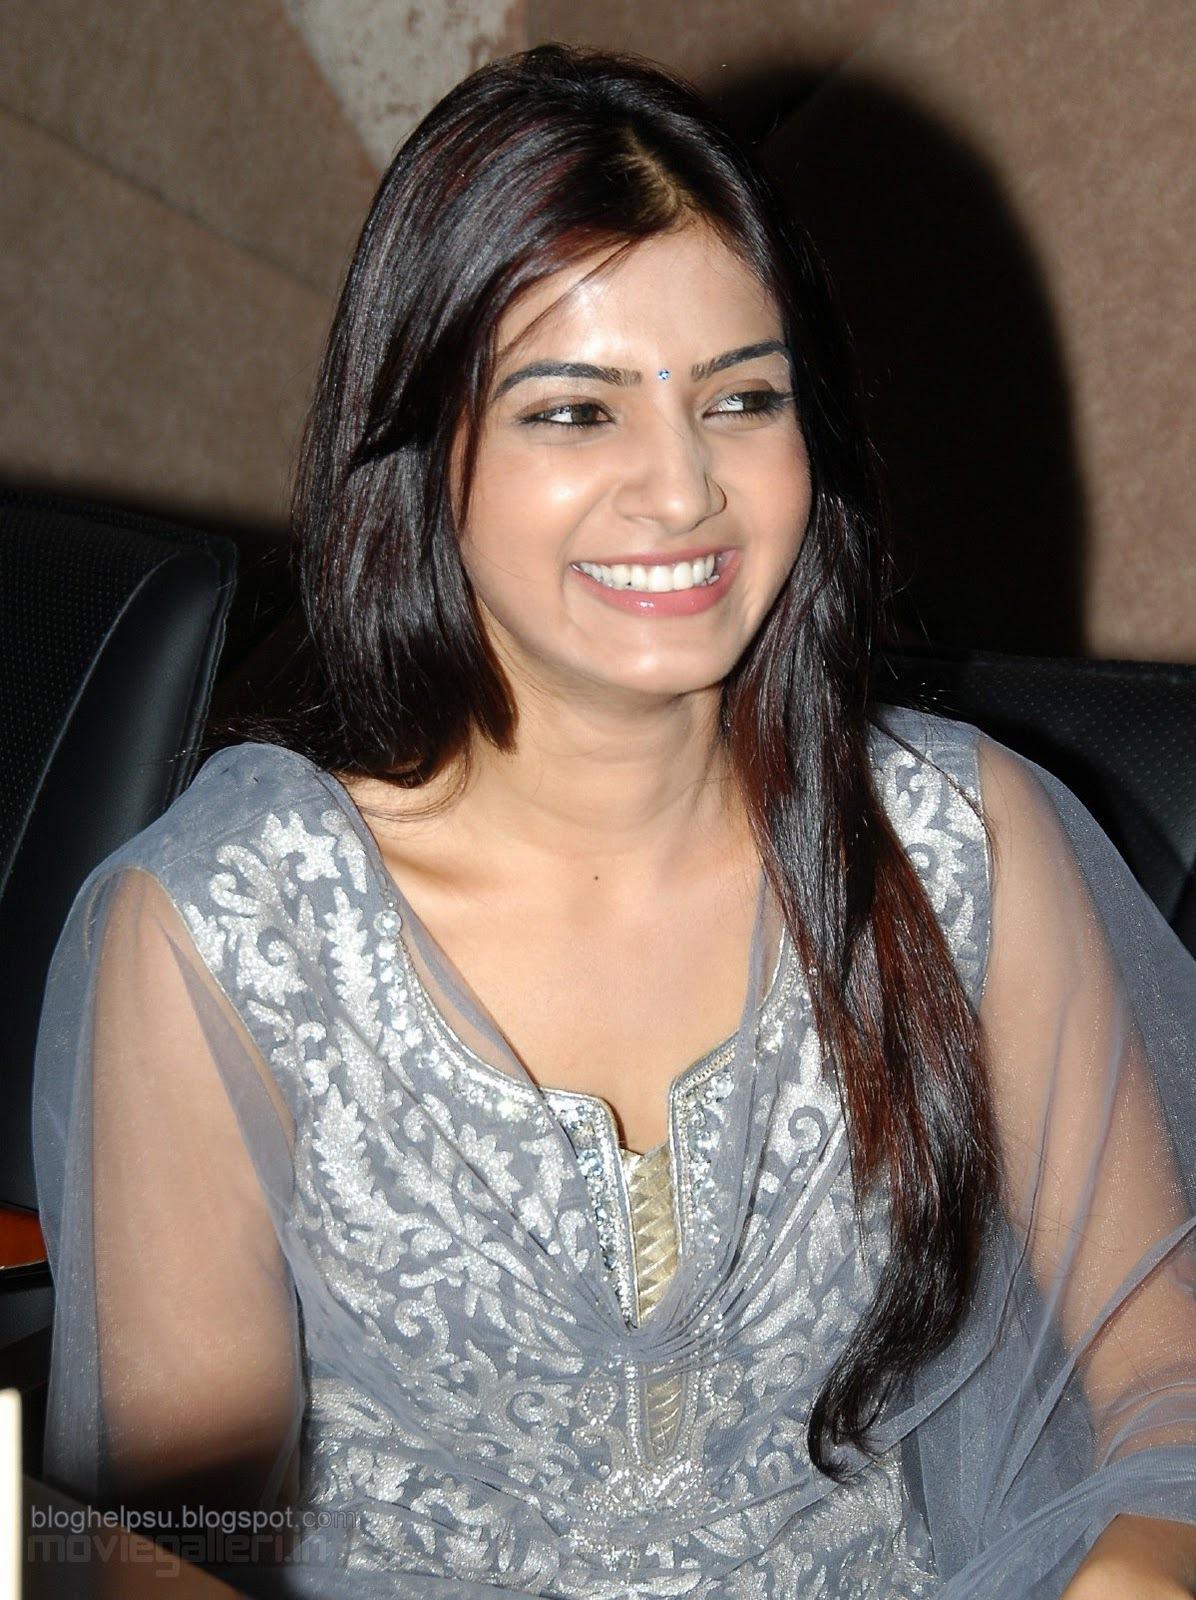 actress samantha cute smile stills, samantha smile wallpapers